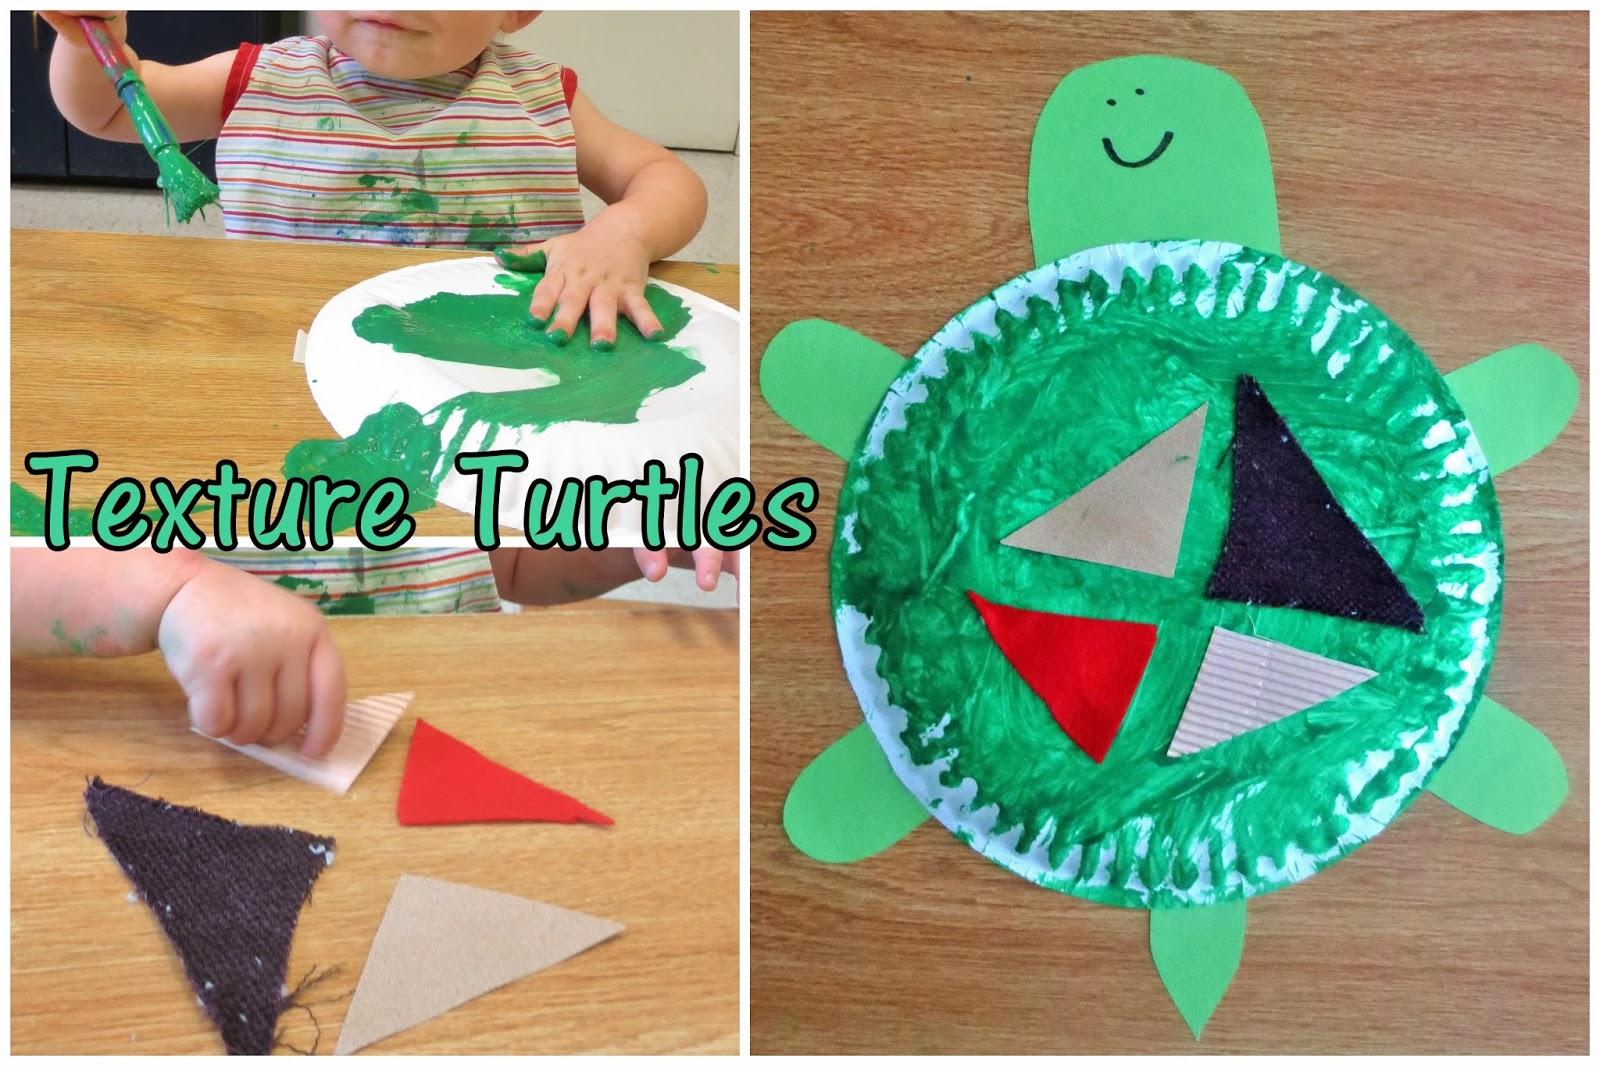 Princesses, Pies, & Preschool Pizzazz: Texture Turtles